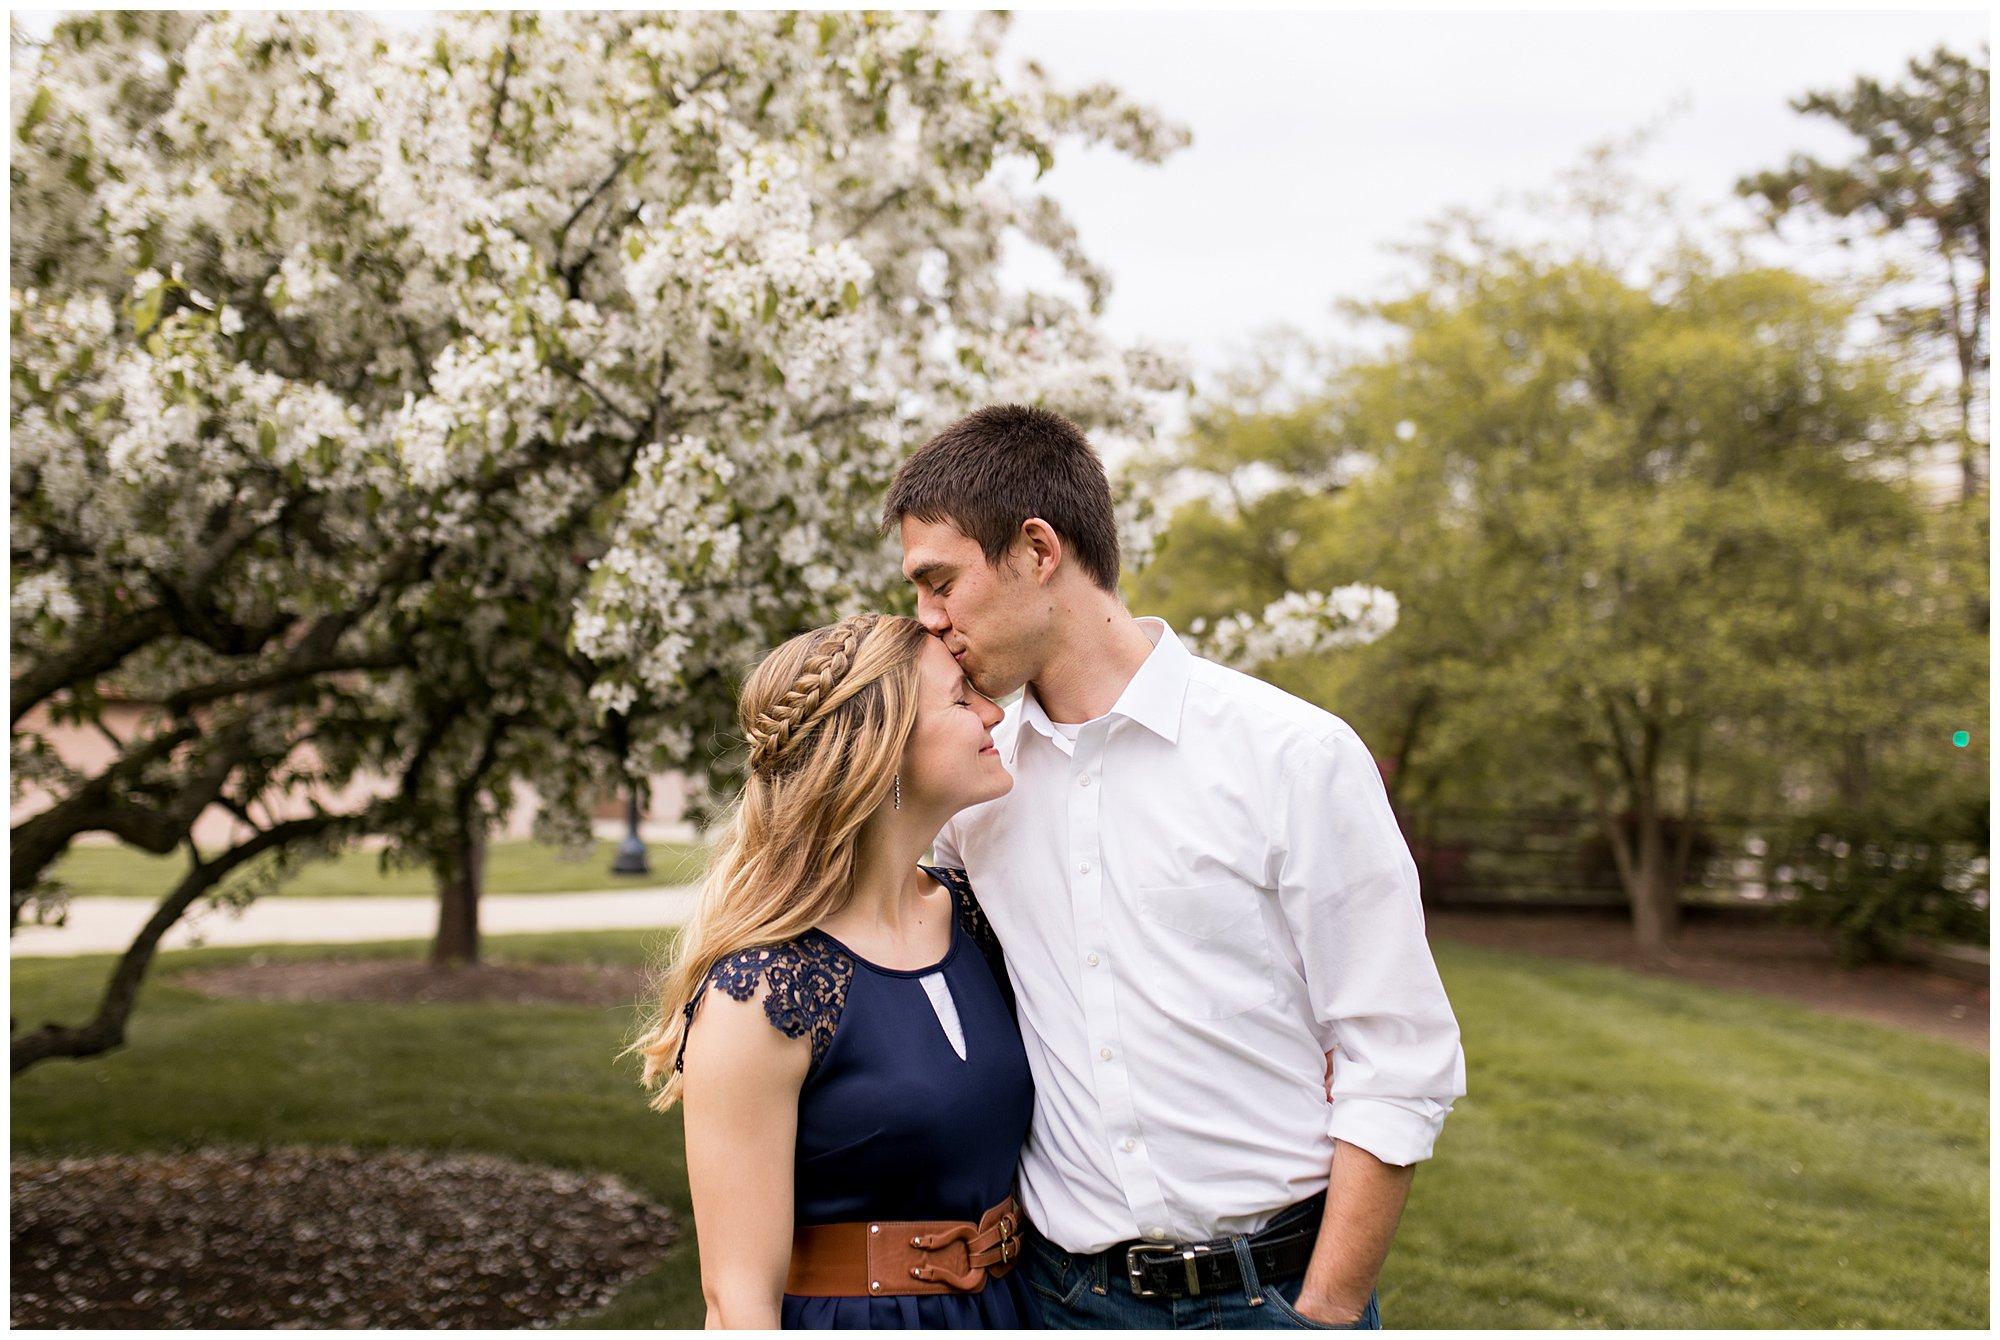 groom kisses bride's head during engagement photos at Purdue University